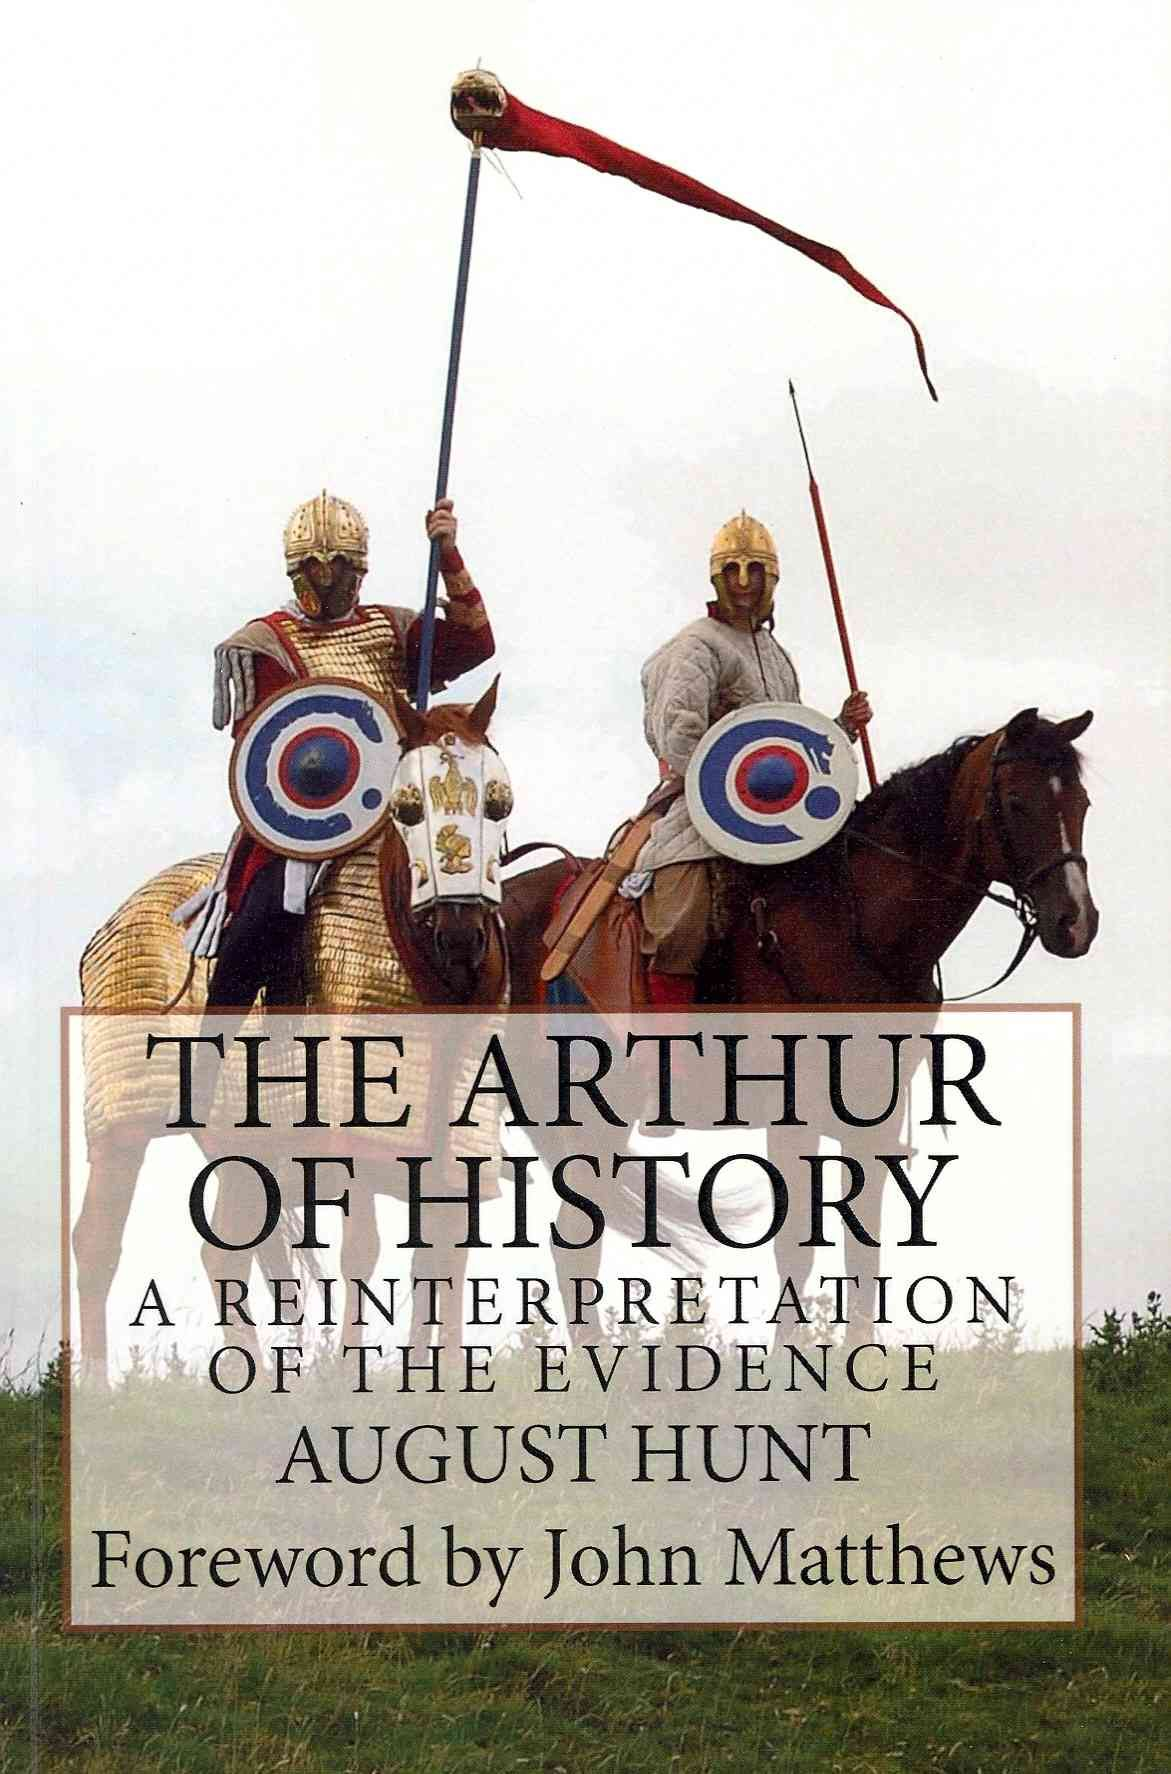 The Arthur of History: A Reinterpretation of the Evidence